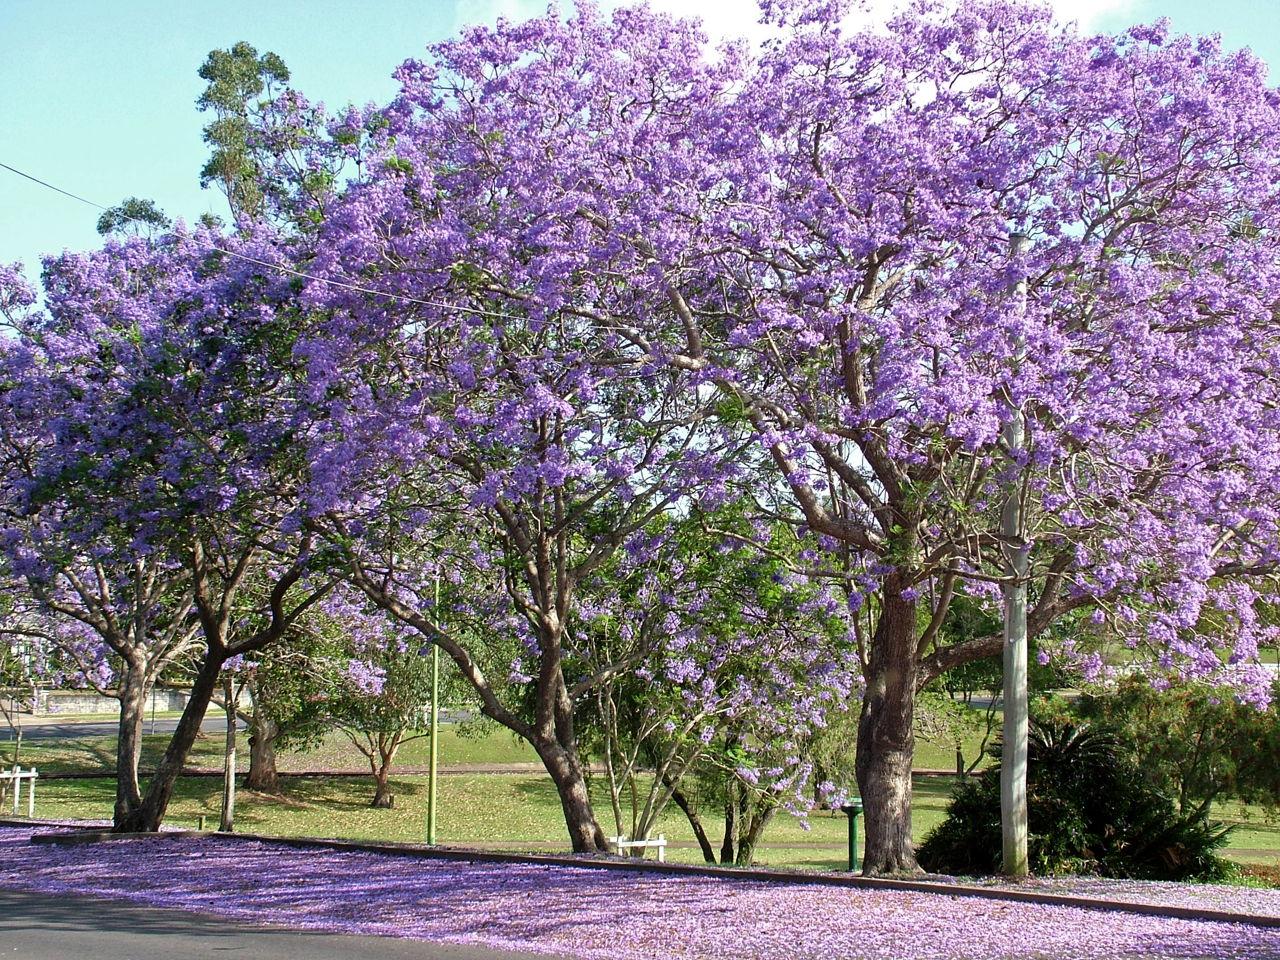 Jacaranda Tree - Gardenerdy